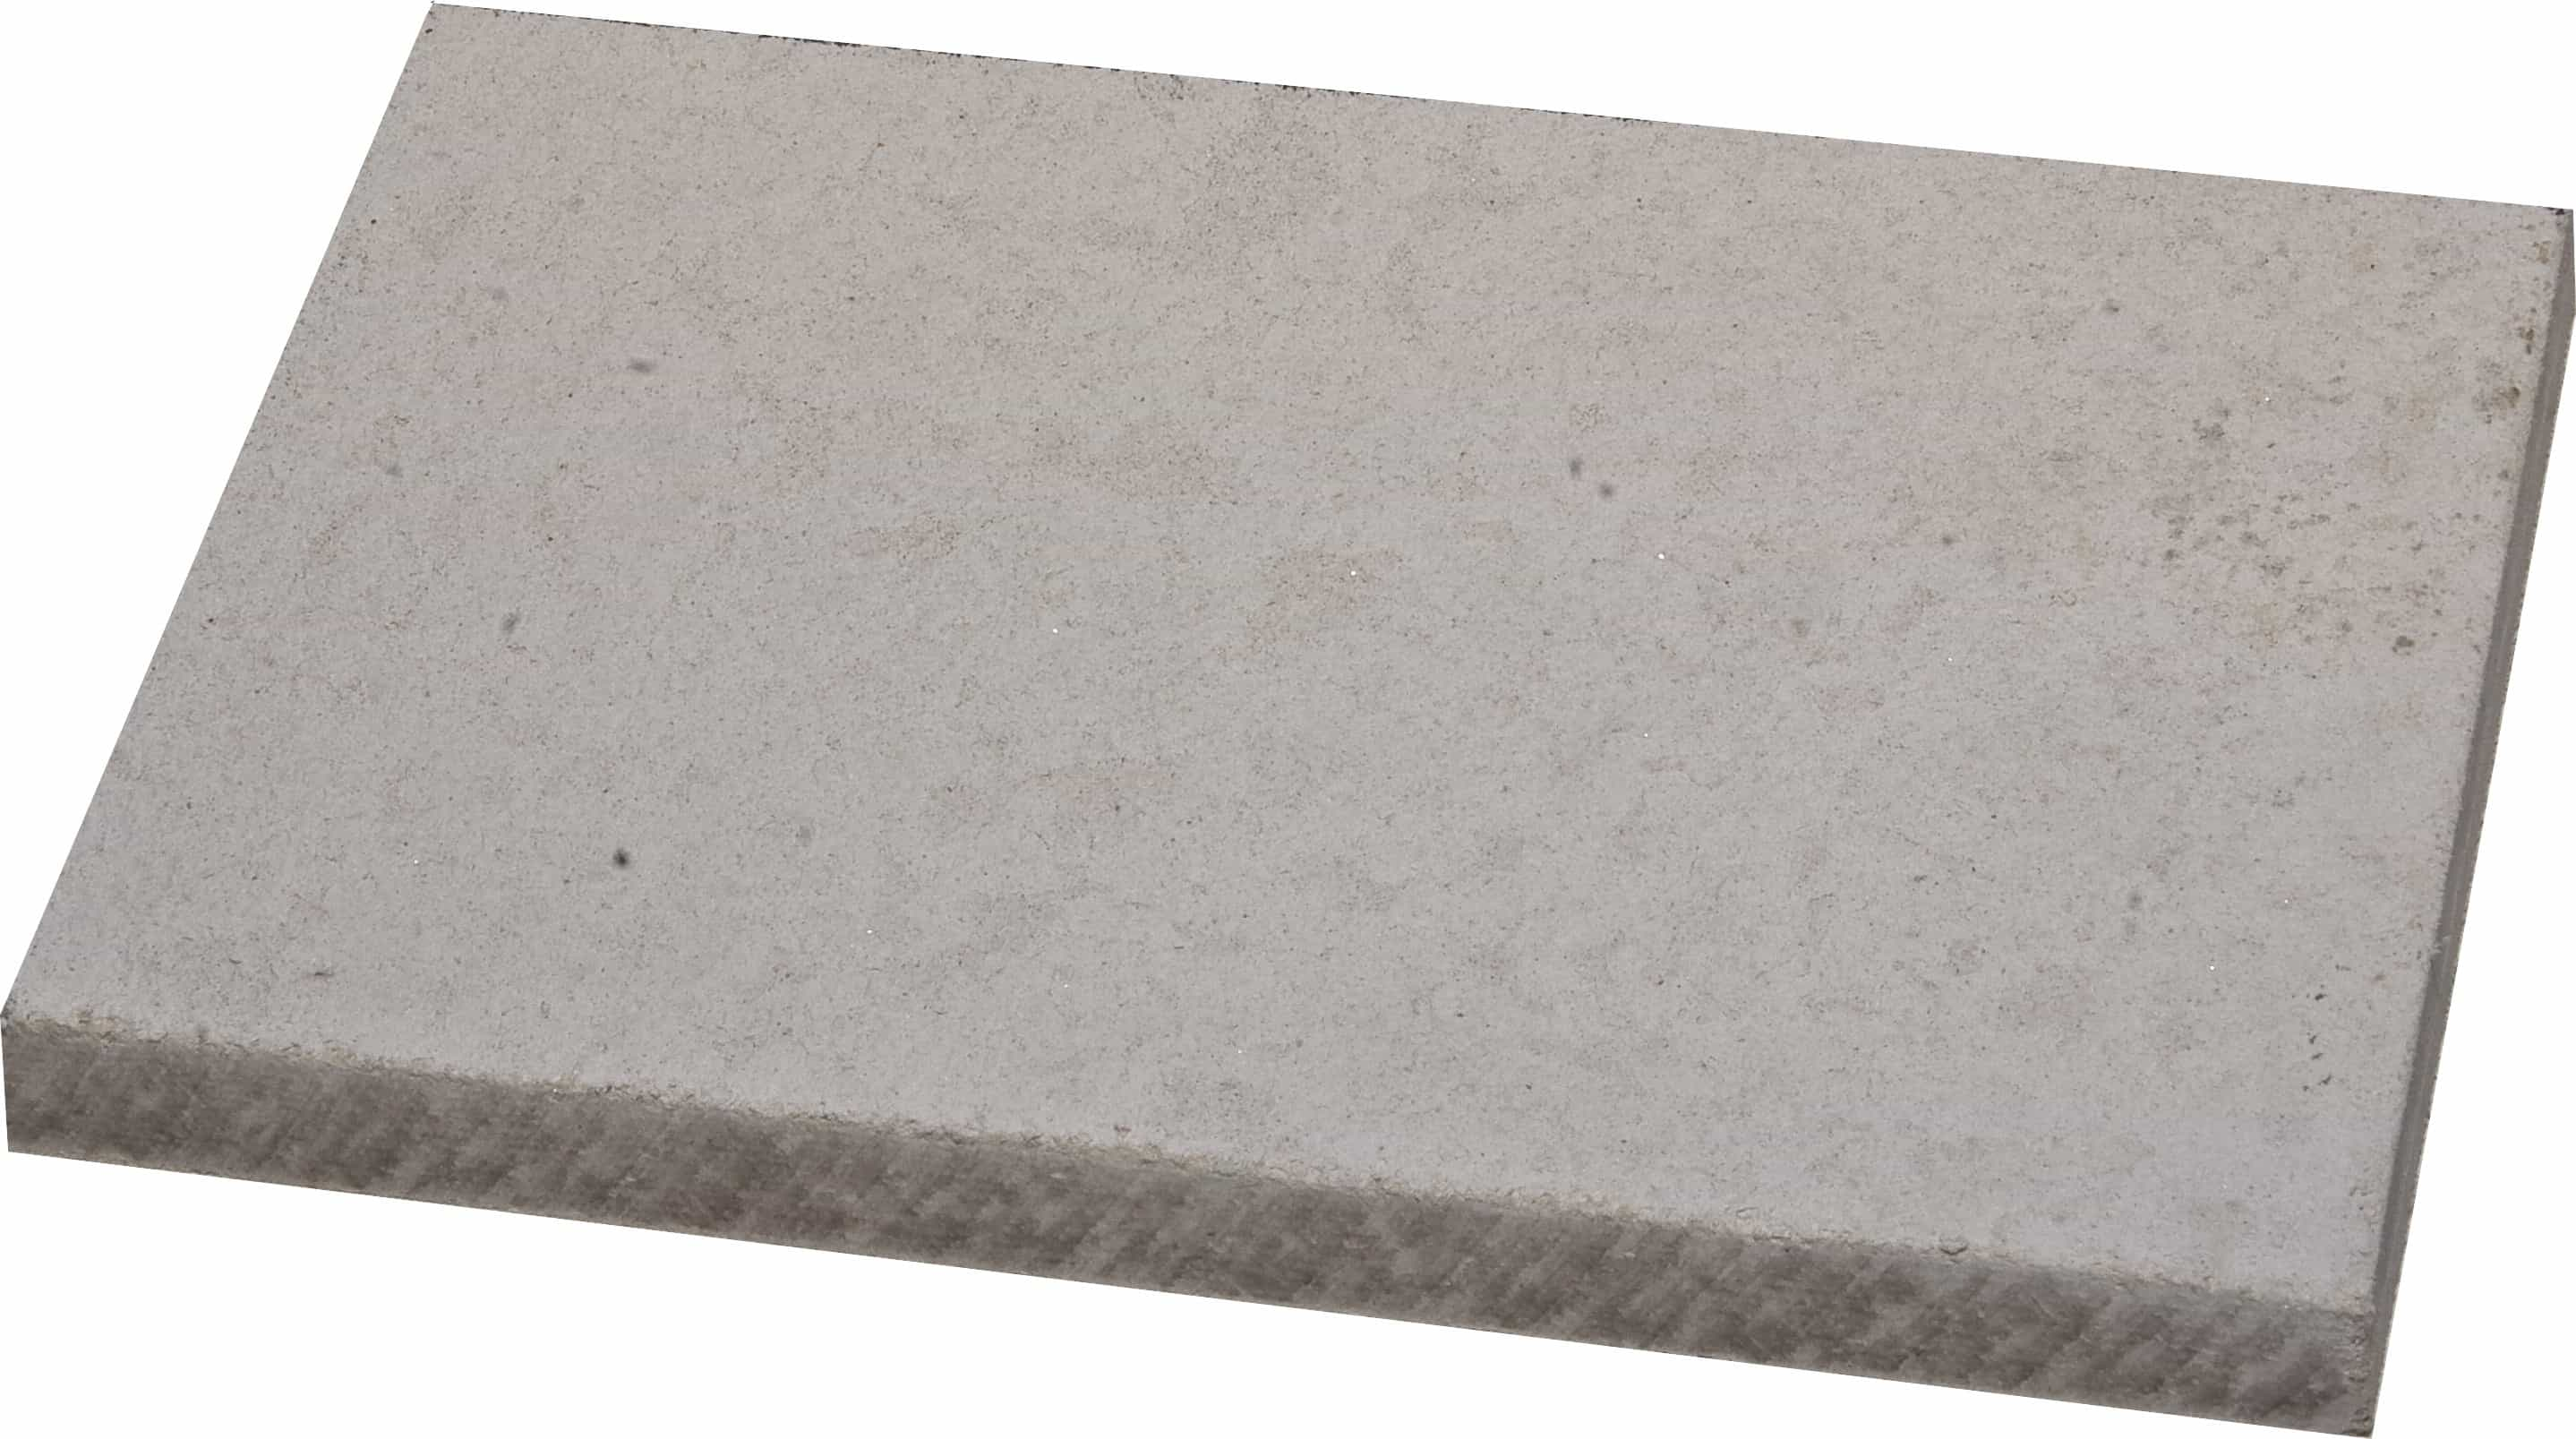 Rcm Siltech Building Board Ajw Distribution